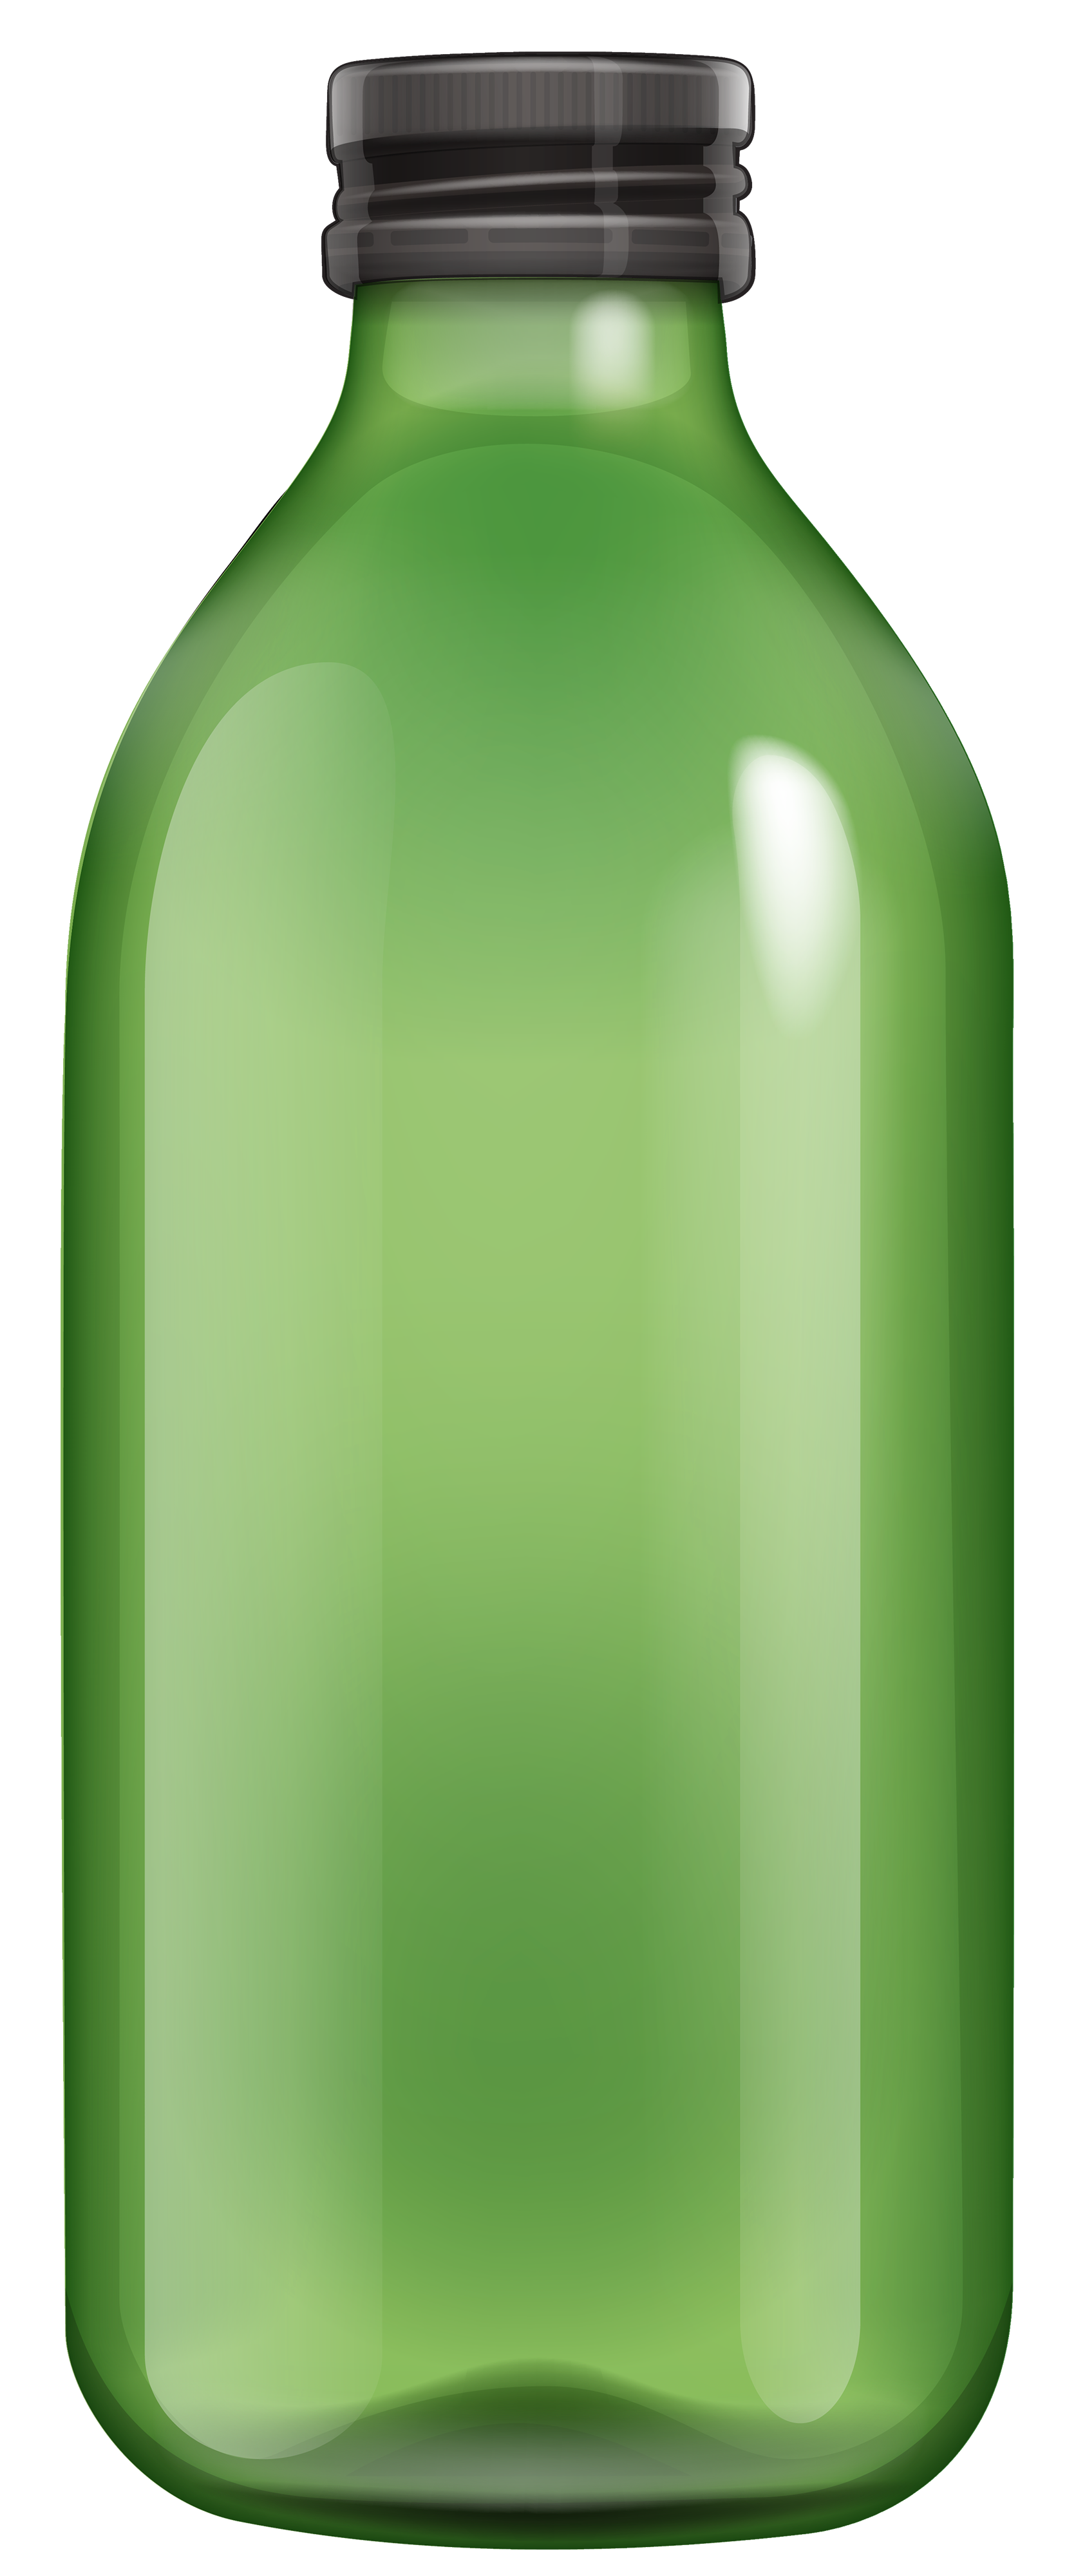 clip art transparent Green png best web. Bottle clipart.